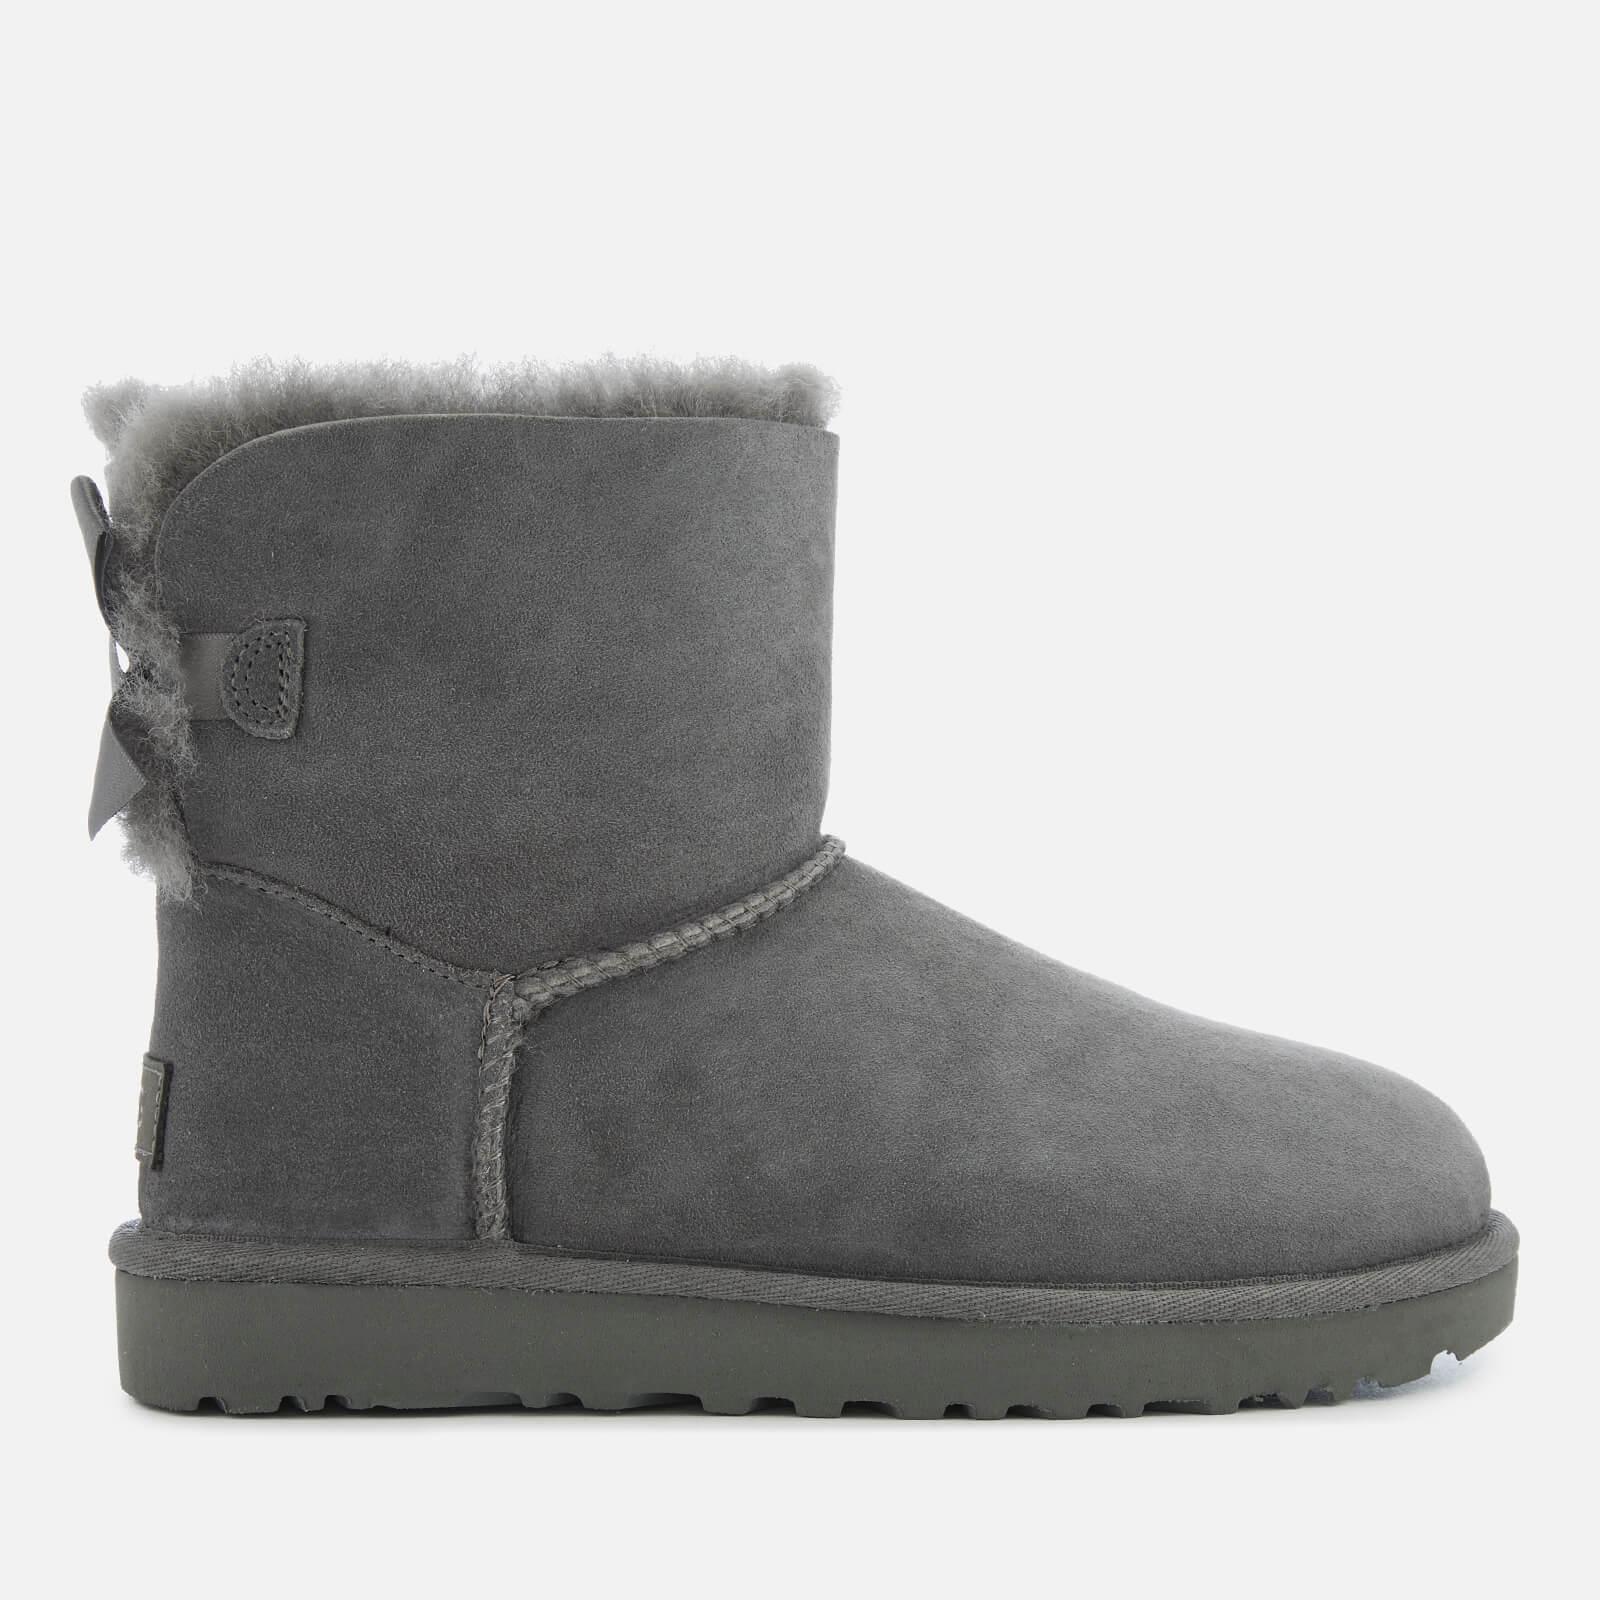 UGG Women's Mini Bailey Bow II Sheepskin Boots - Grey - UK 3